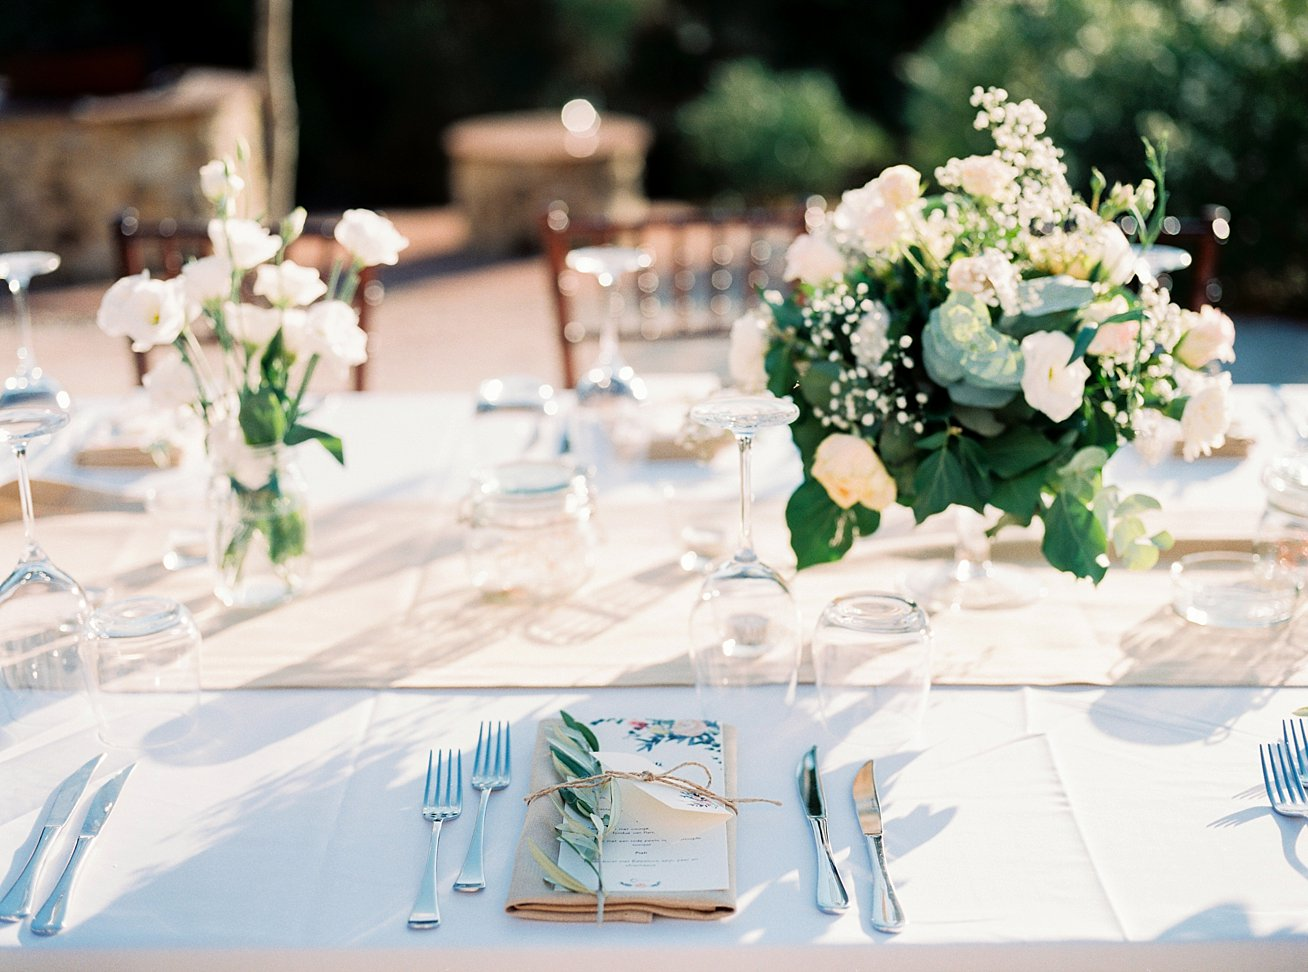 Amanda-Drost-Fotografie-Bruioft-Italie-Trouwen-buitenland-destination-wedding-italy_0072.jpg